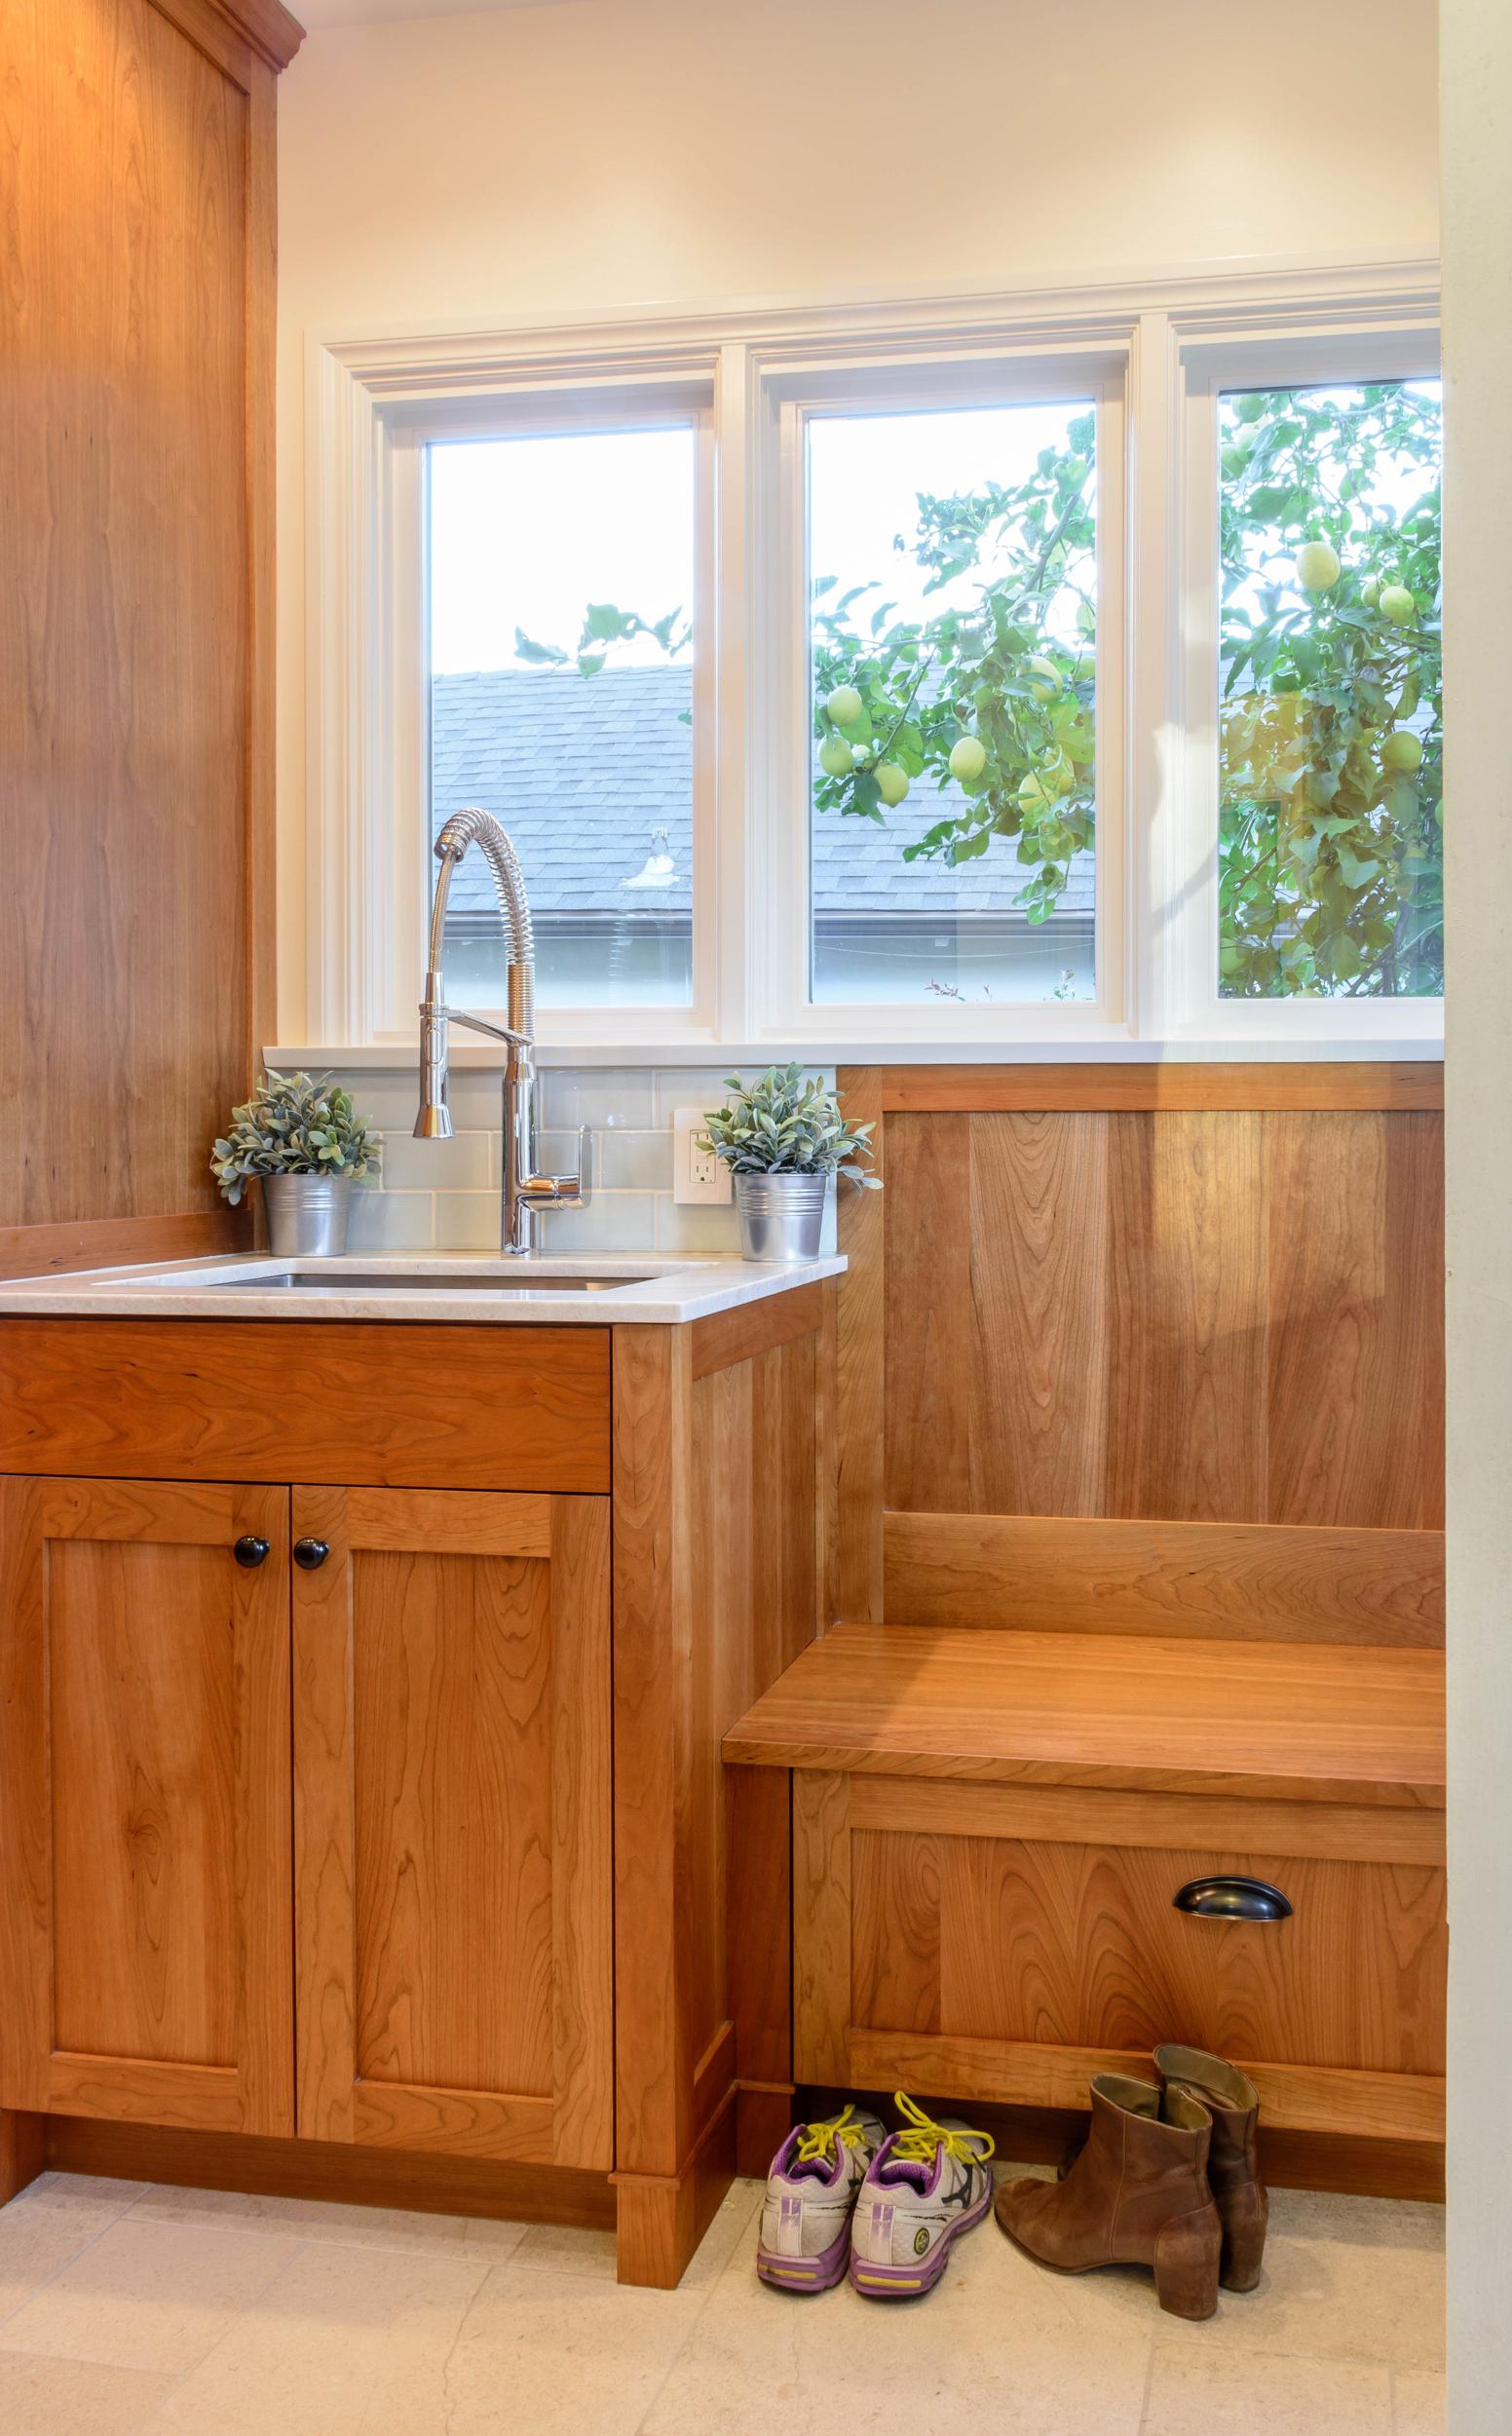 Tudor-Kitchen-Remodel-Mud-Room-Laundry-Sink-Bench.jpg